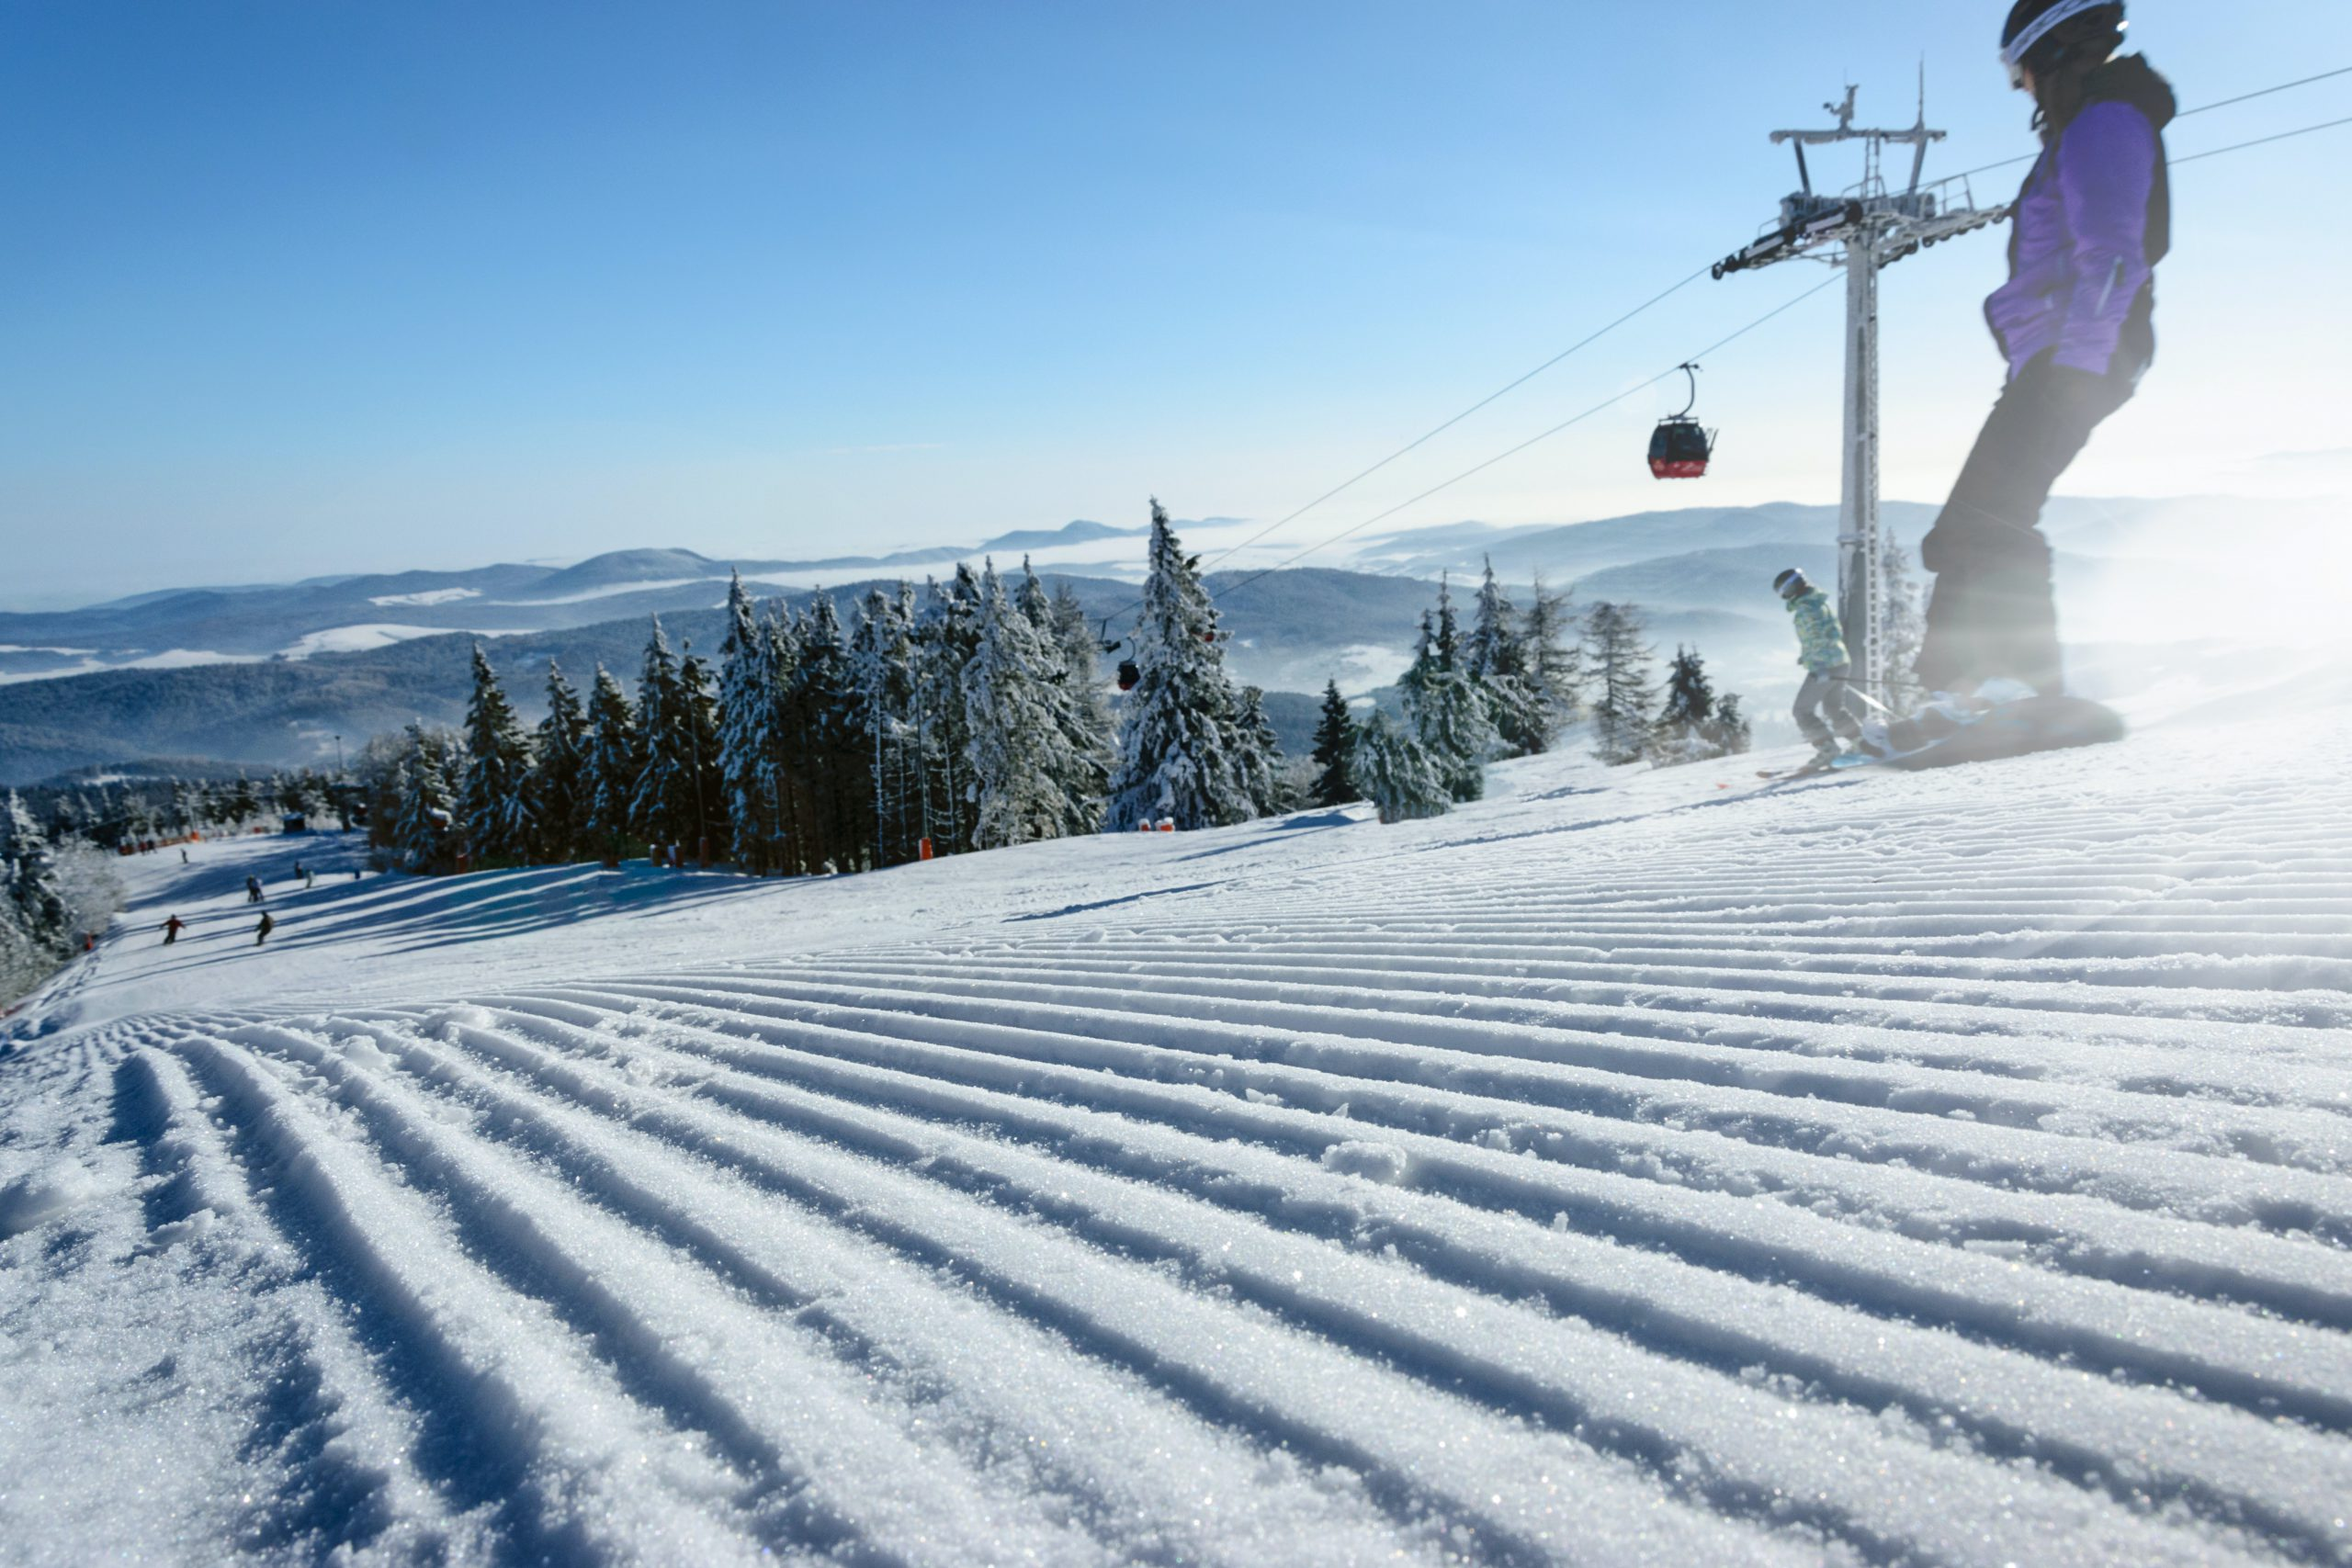 Snowboard kiezen